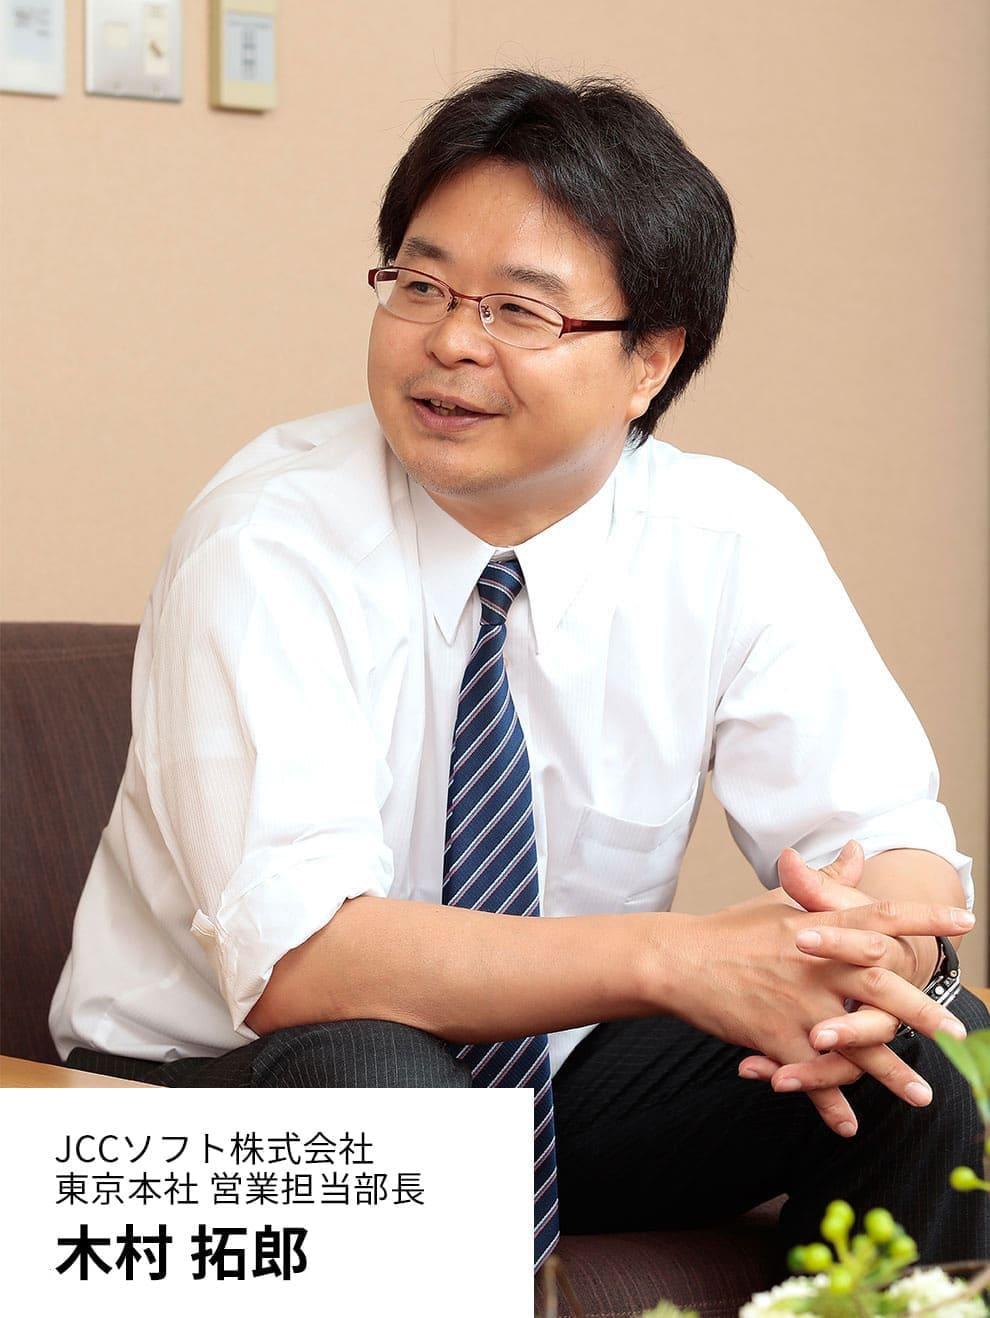 JCCソフト 東京支社営業部課長